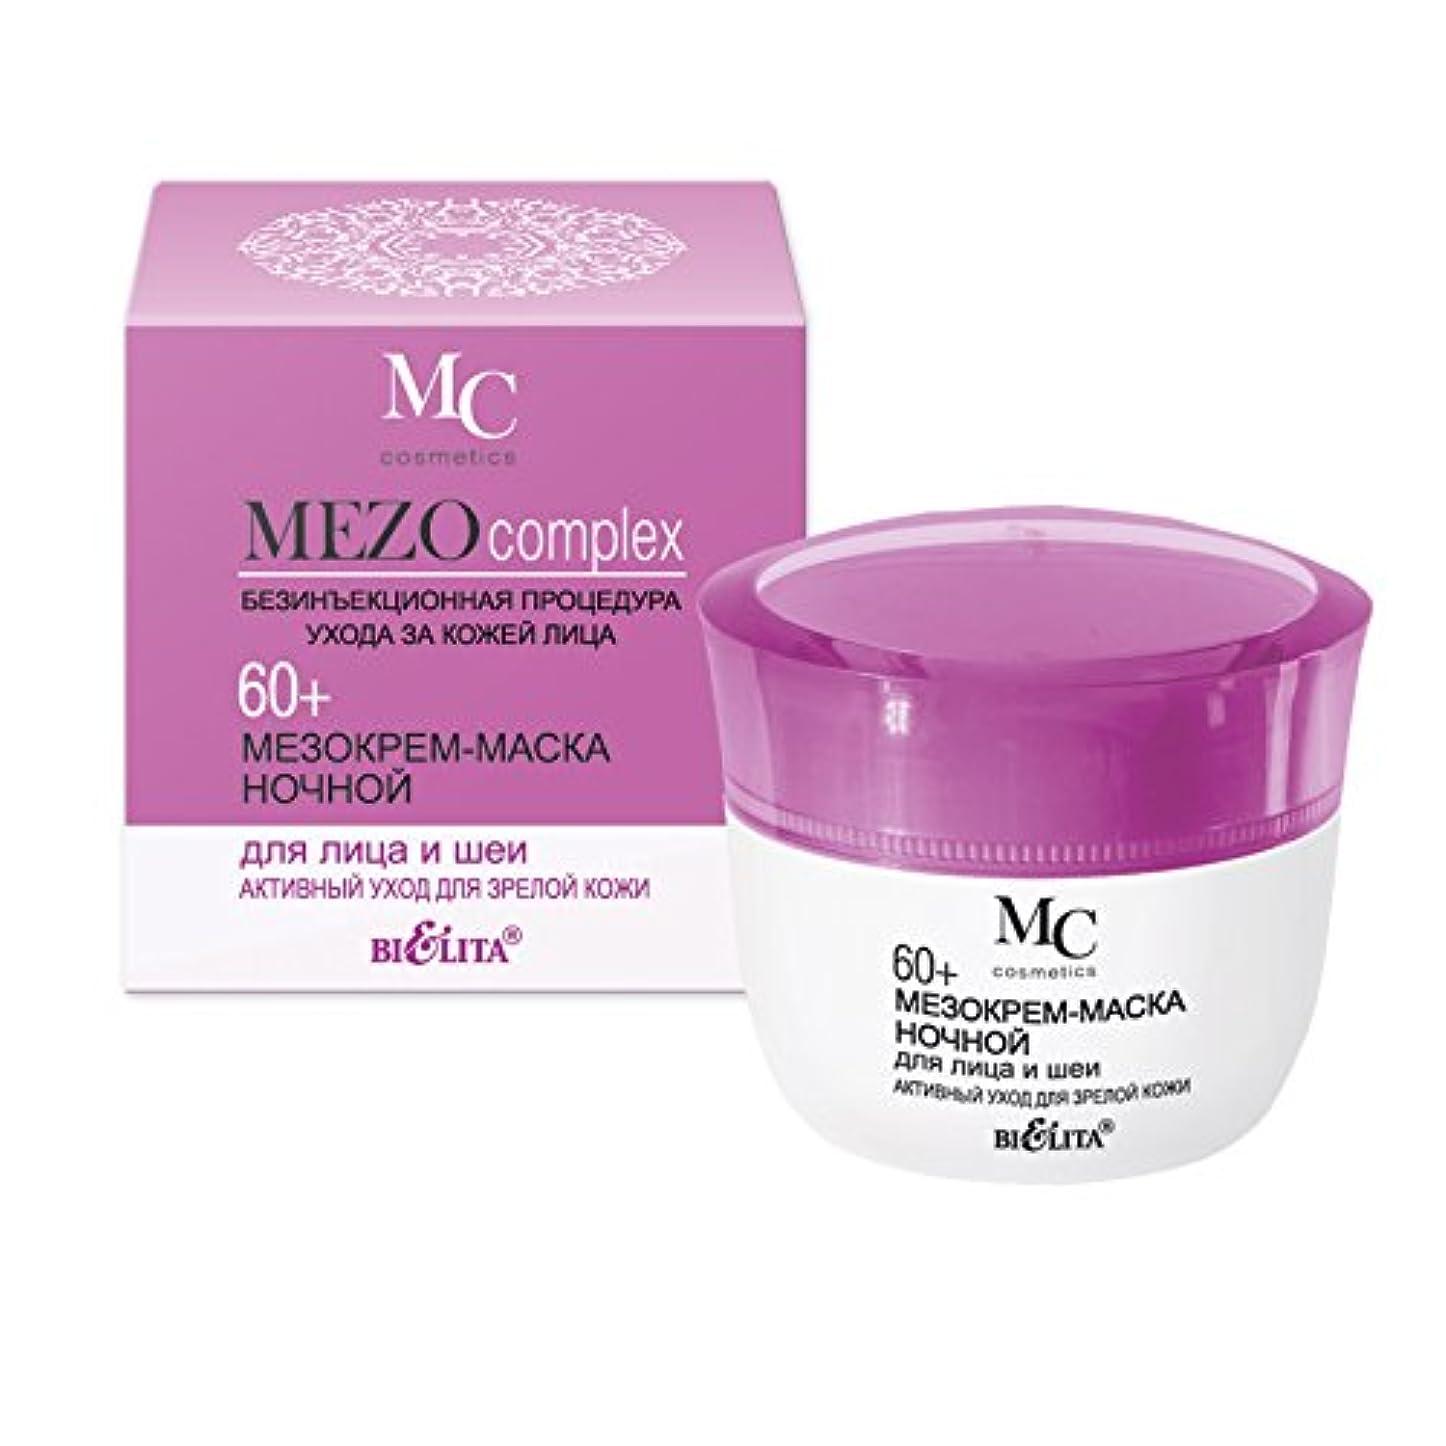 Night cream mask (MEZO) for face and neck 60+ care for mature skin | Hyaluronic acid, Vitamin E, Peach seed oil...